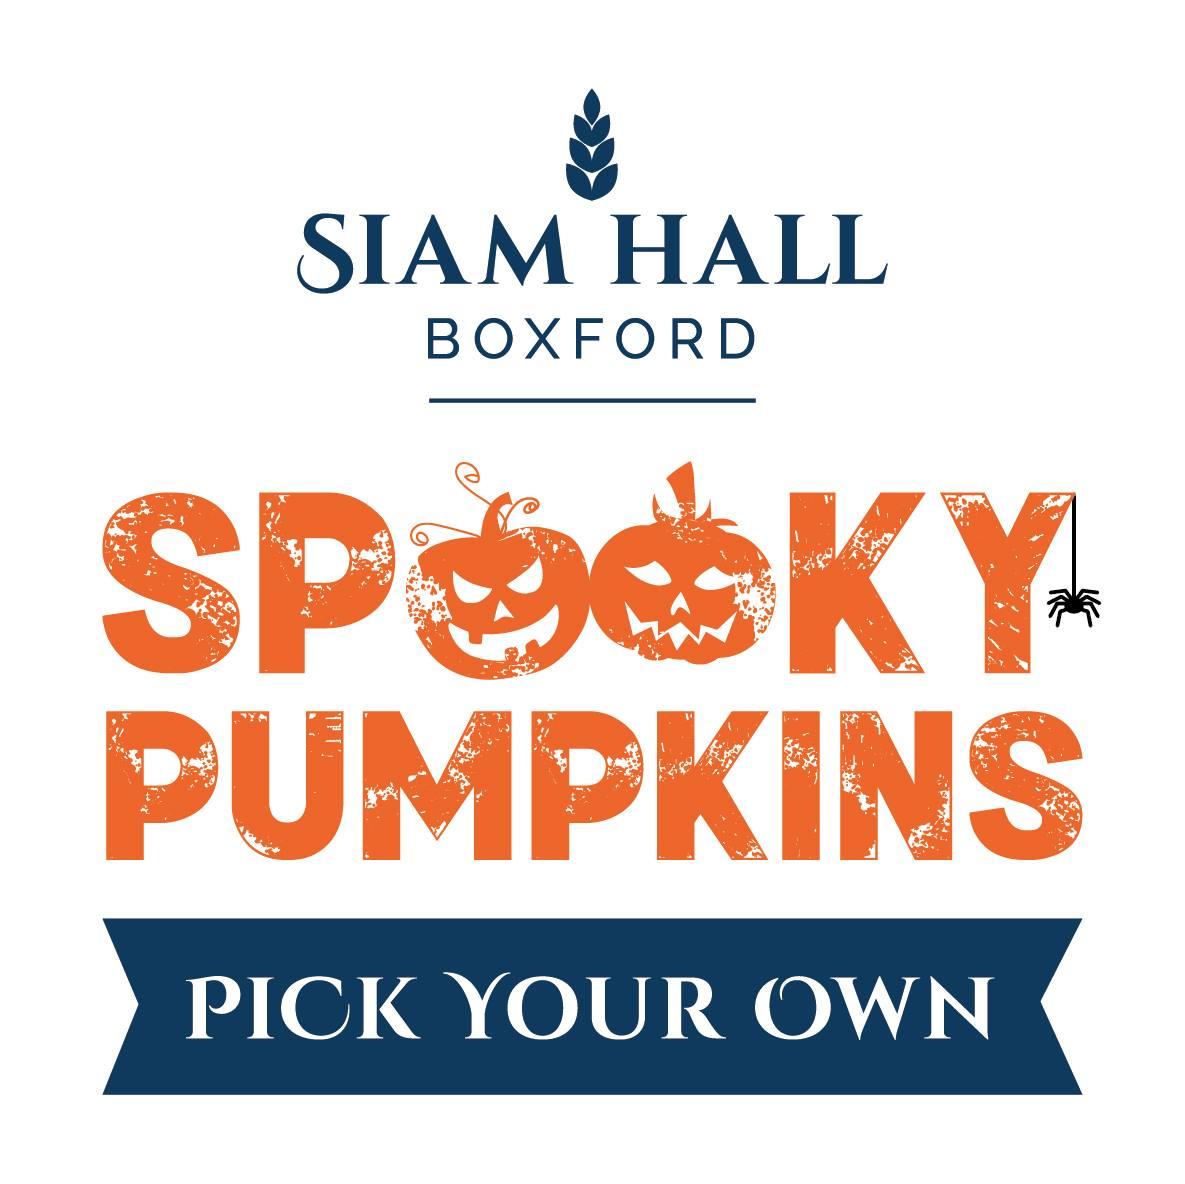 Siam Hall Spooky Pumpkins 's logo